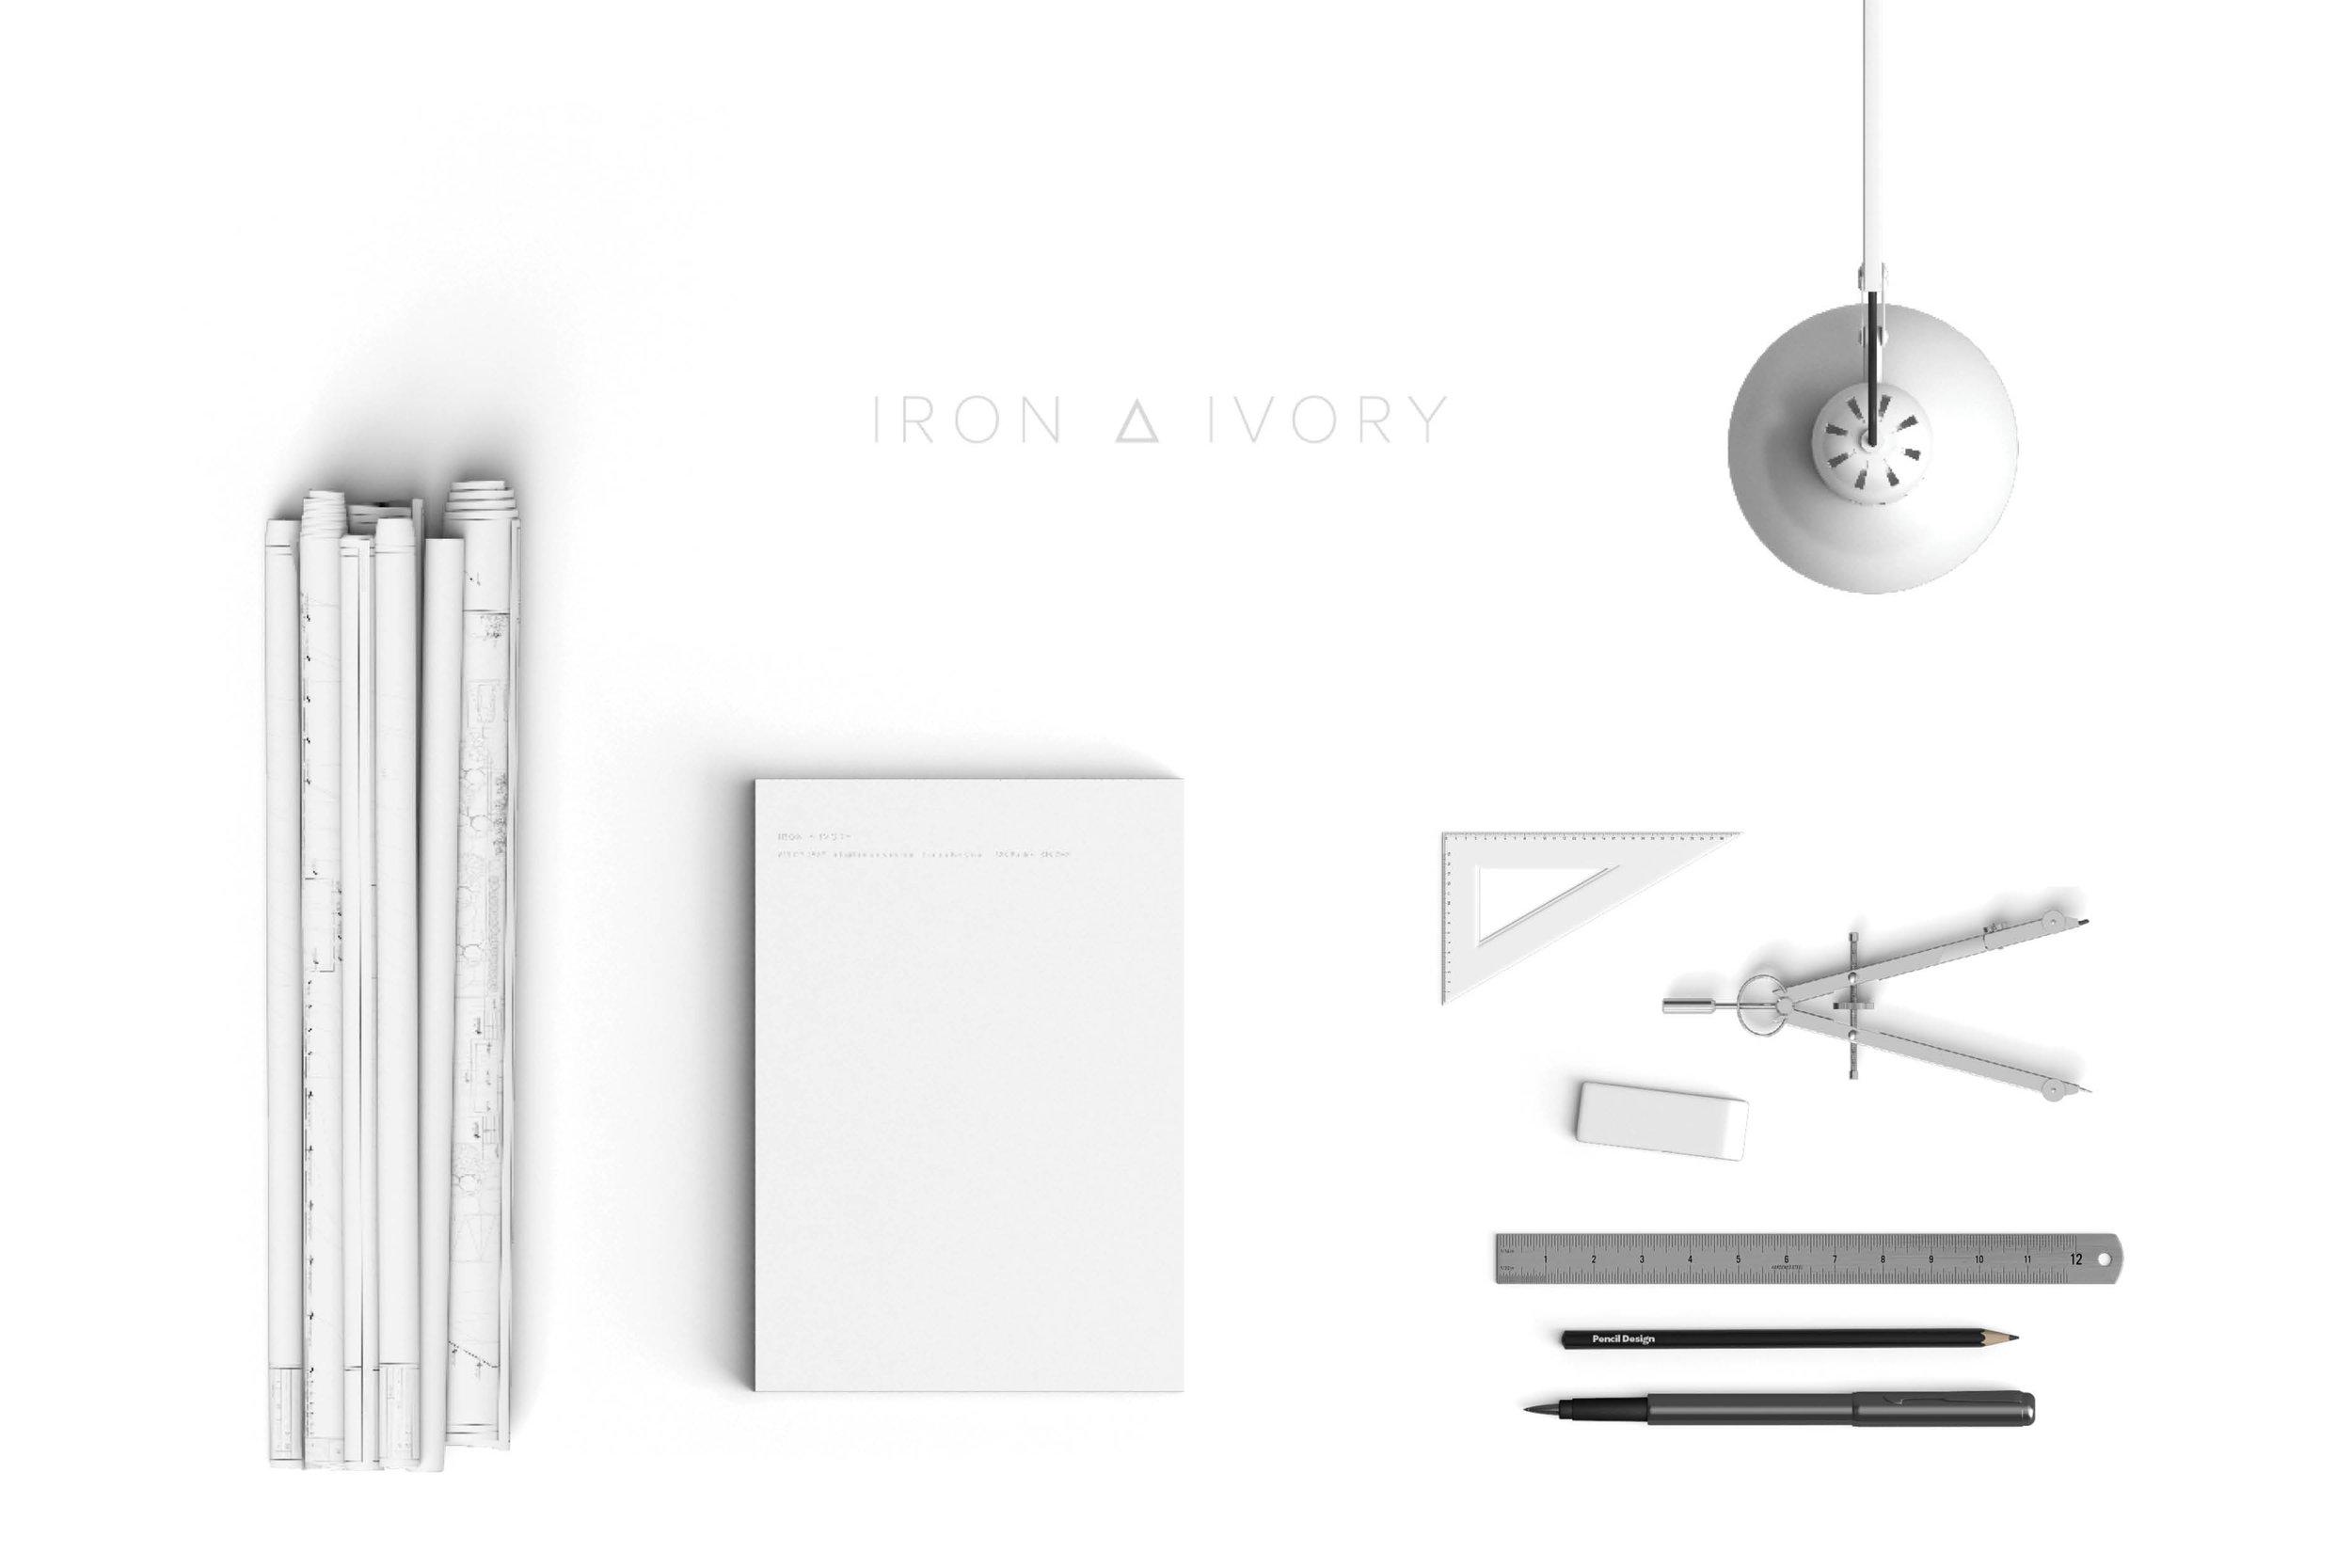 iron-ivory.jpg